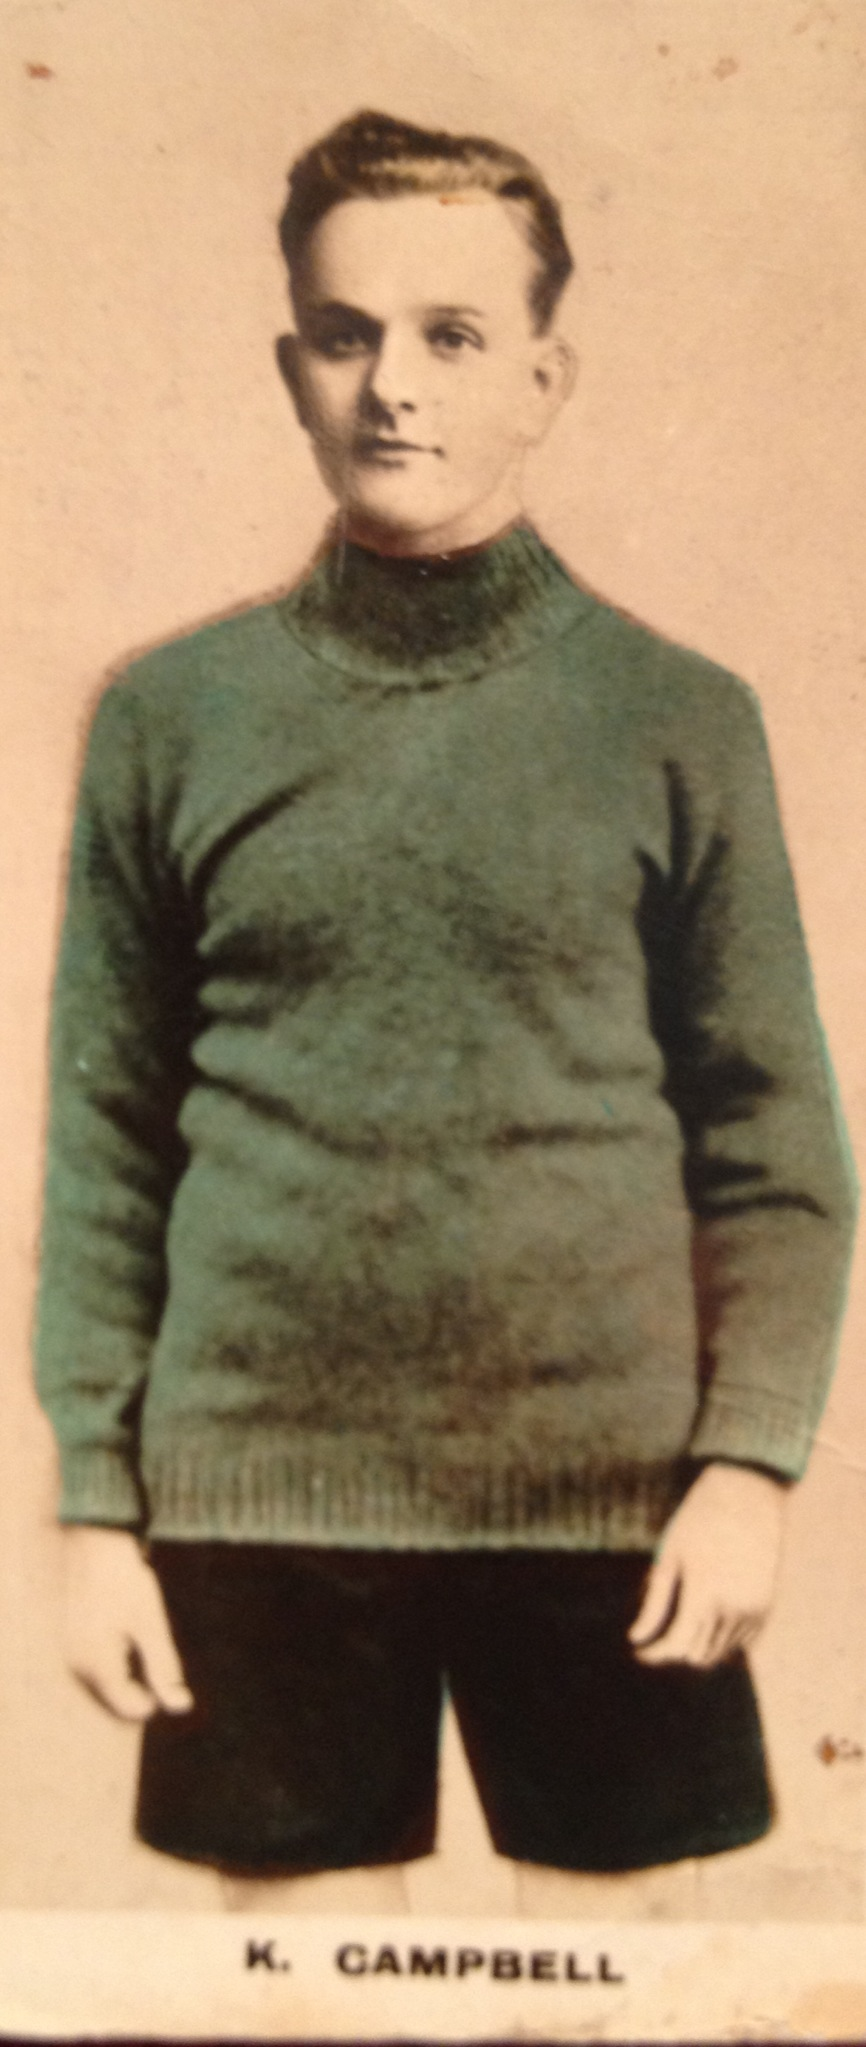 Kenneth Campbell 1922 JC I